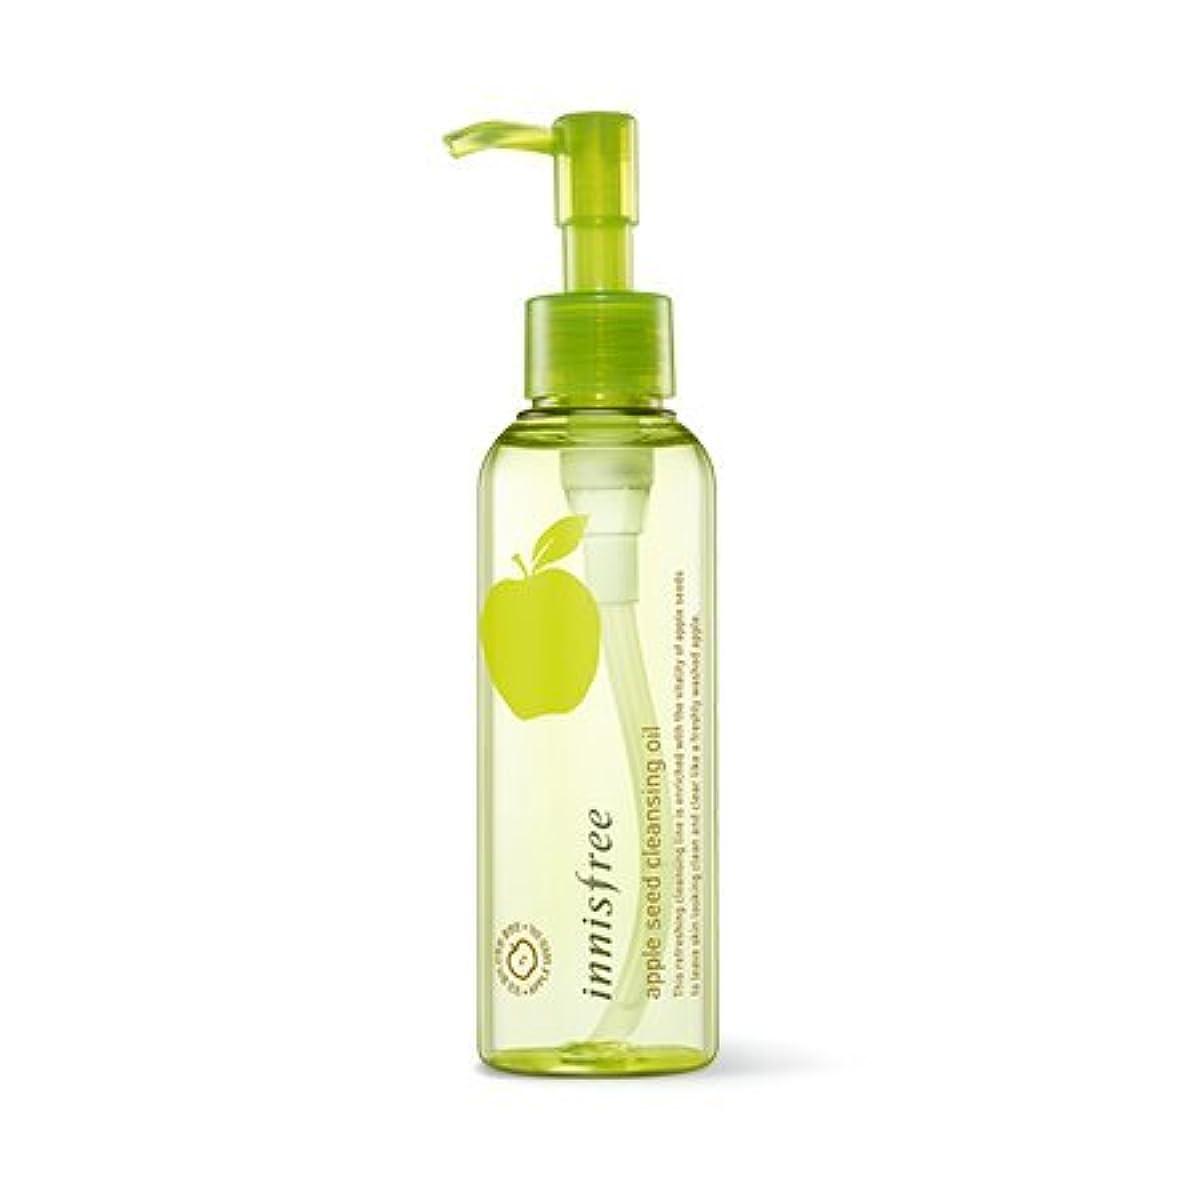 [New] innisfree Apple Seed Cleansing Oil 150ml/イニスフリー アップル シード クレンジング オイル 150ml